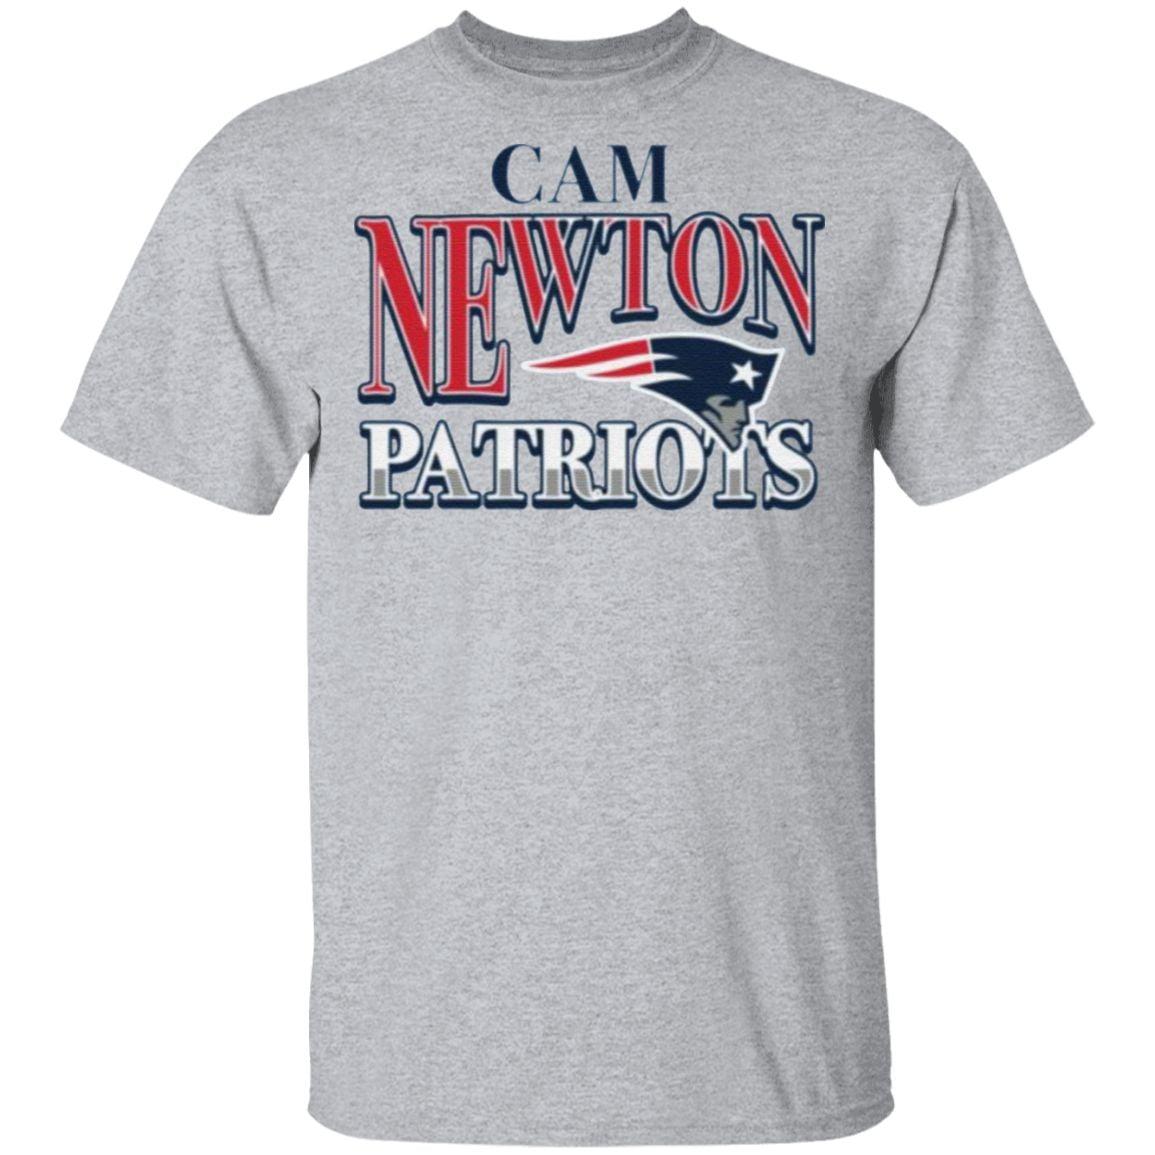 New England Patriots Cam Newton T-Shirt